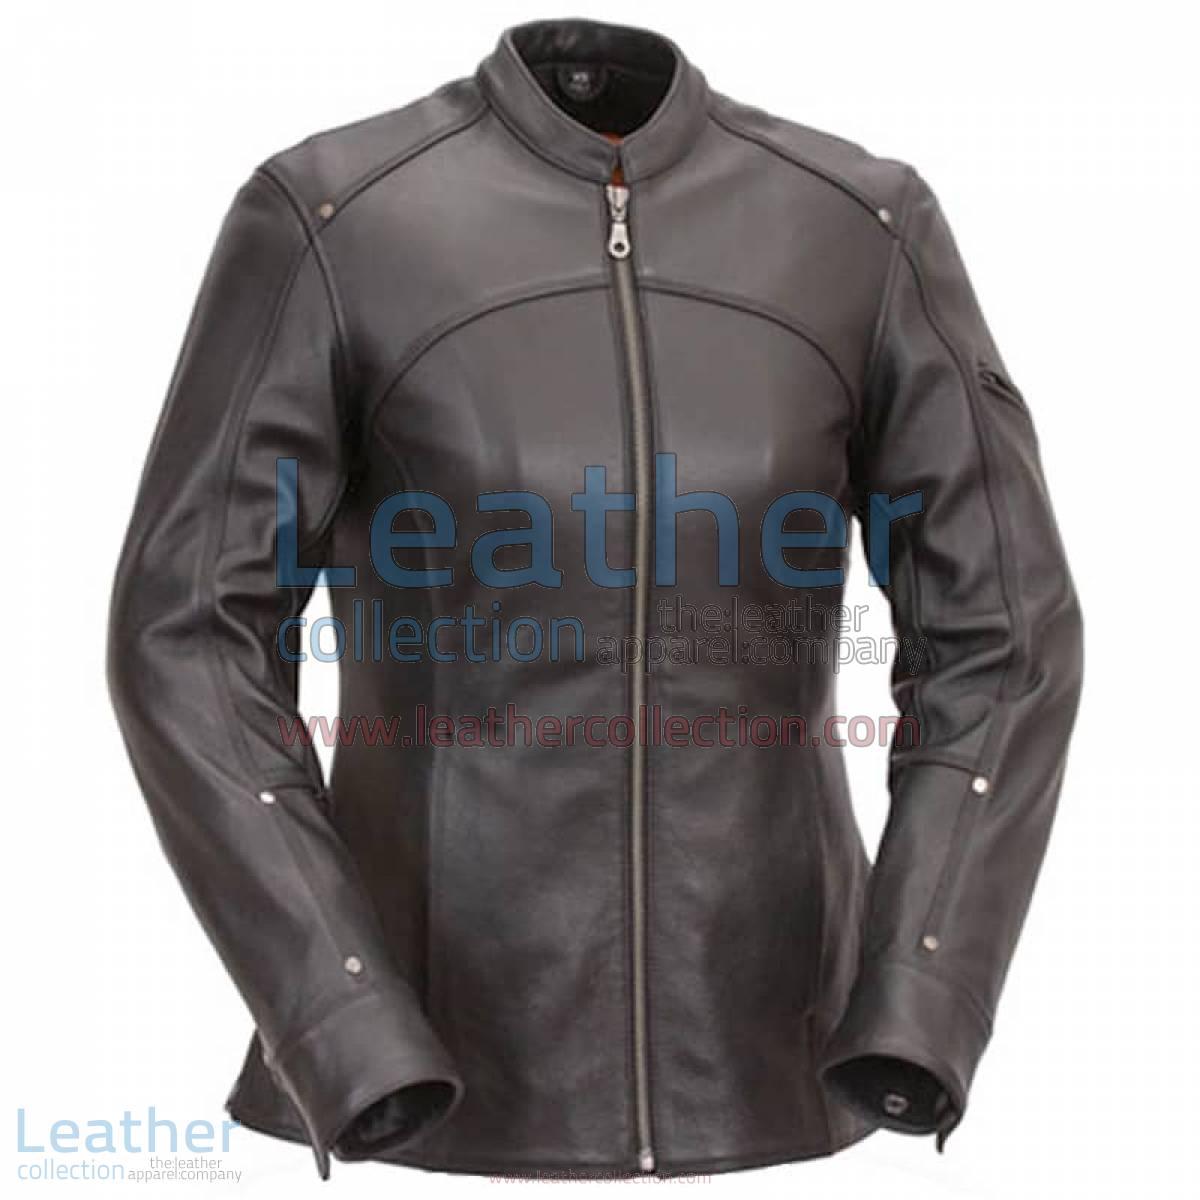 3/4 Length Touring Motorcycle Leather Jacket